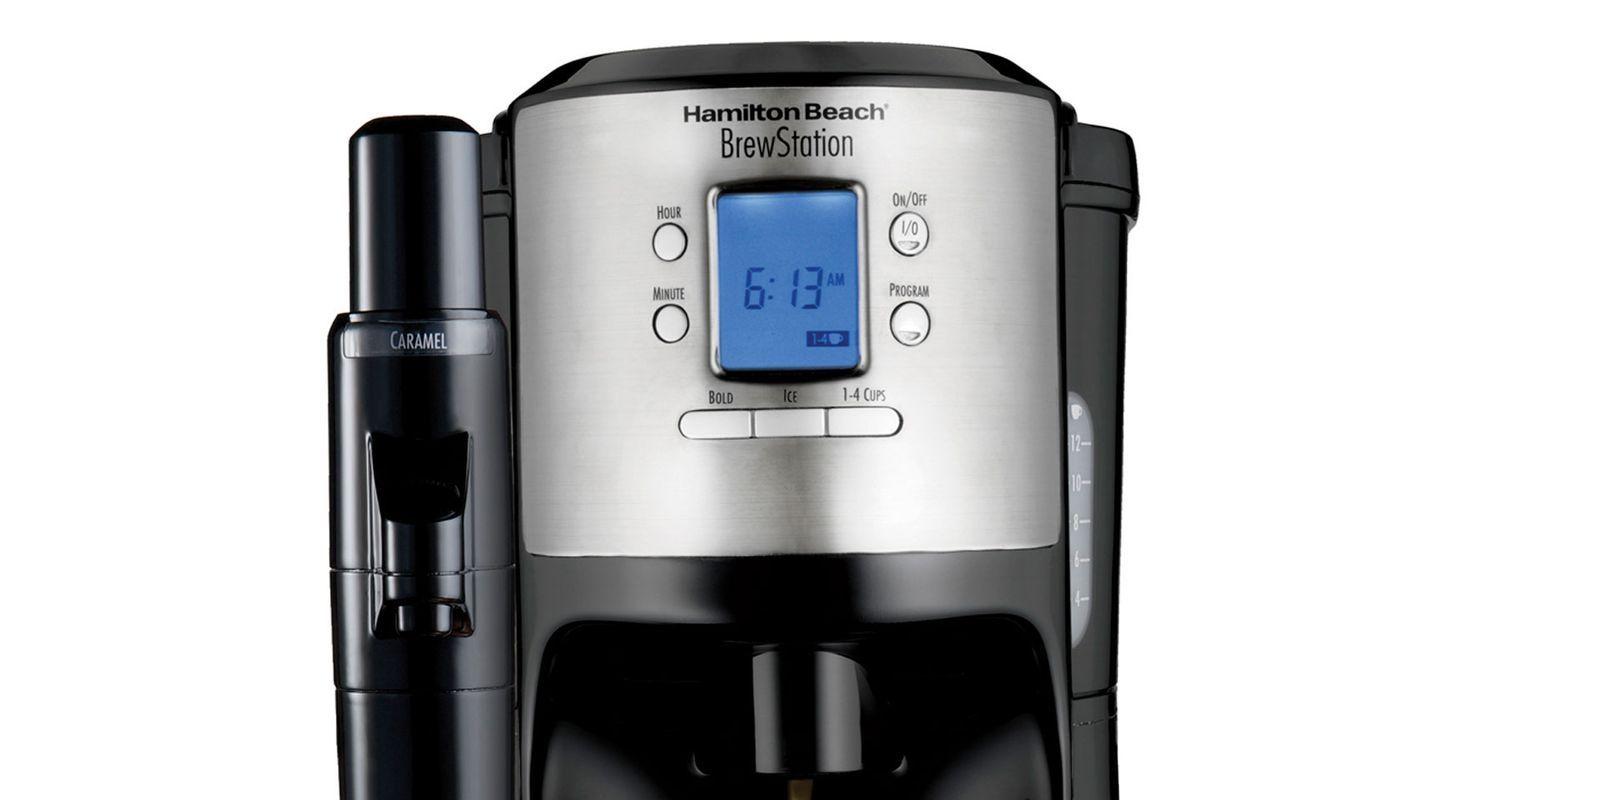 hamilton beach brewstation coffeemaker with flavor dispenser 49150 rh goodhousekeeping com hamilton beach brewstation 48464 manual hamilton beach brewstation 48464 manual